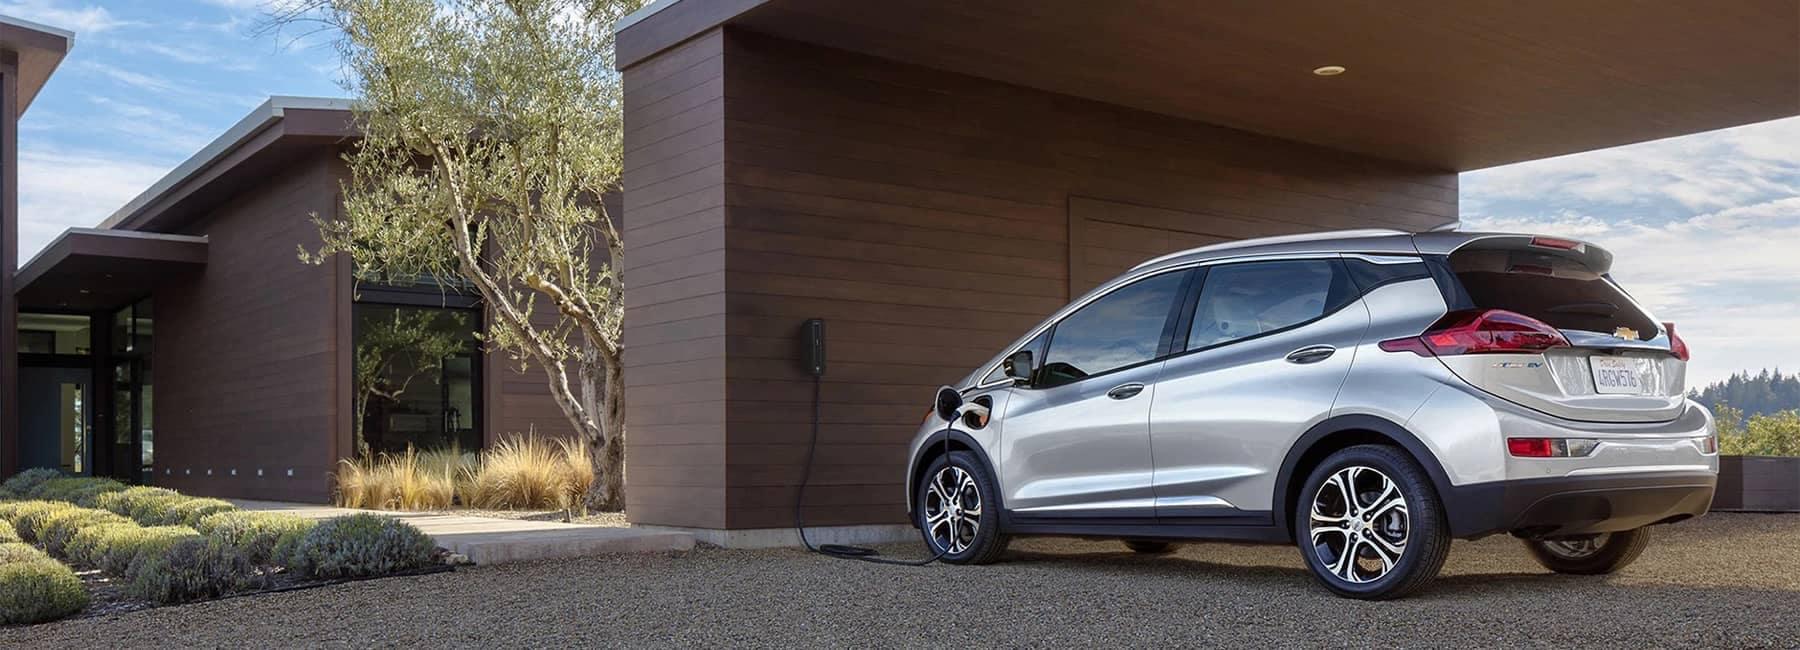 2020 Silver Bolt EV Electric Car Exterior Charging Rear